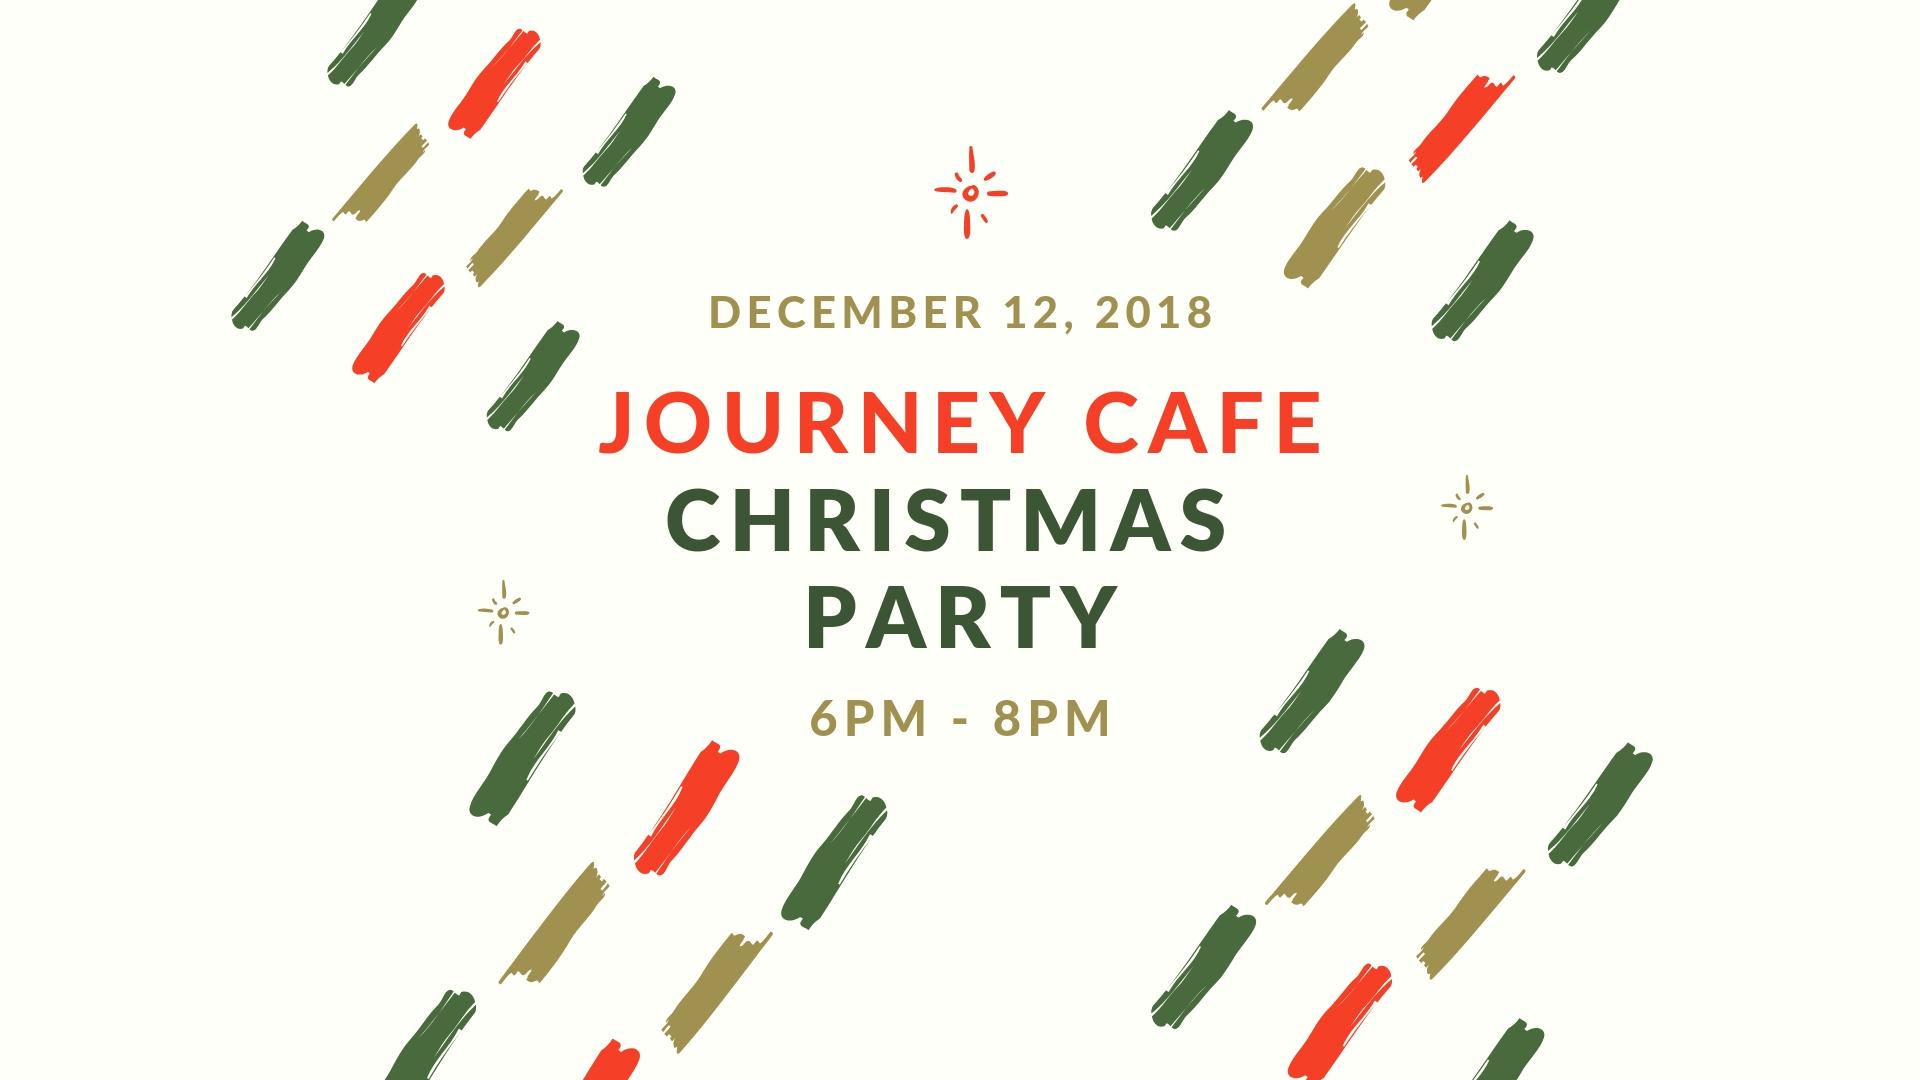 Journey Cafe1.jpg